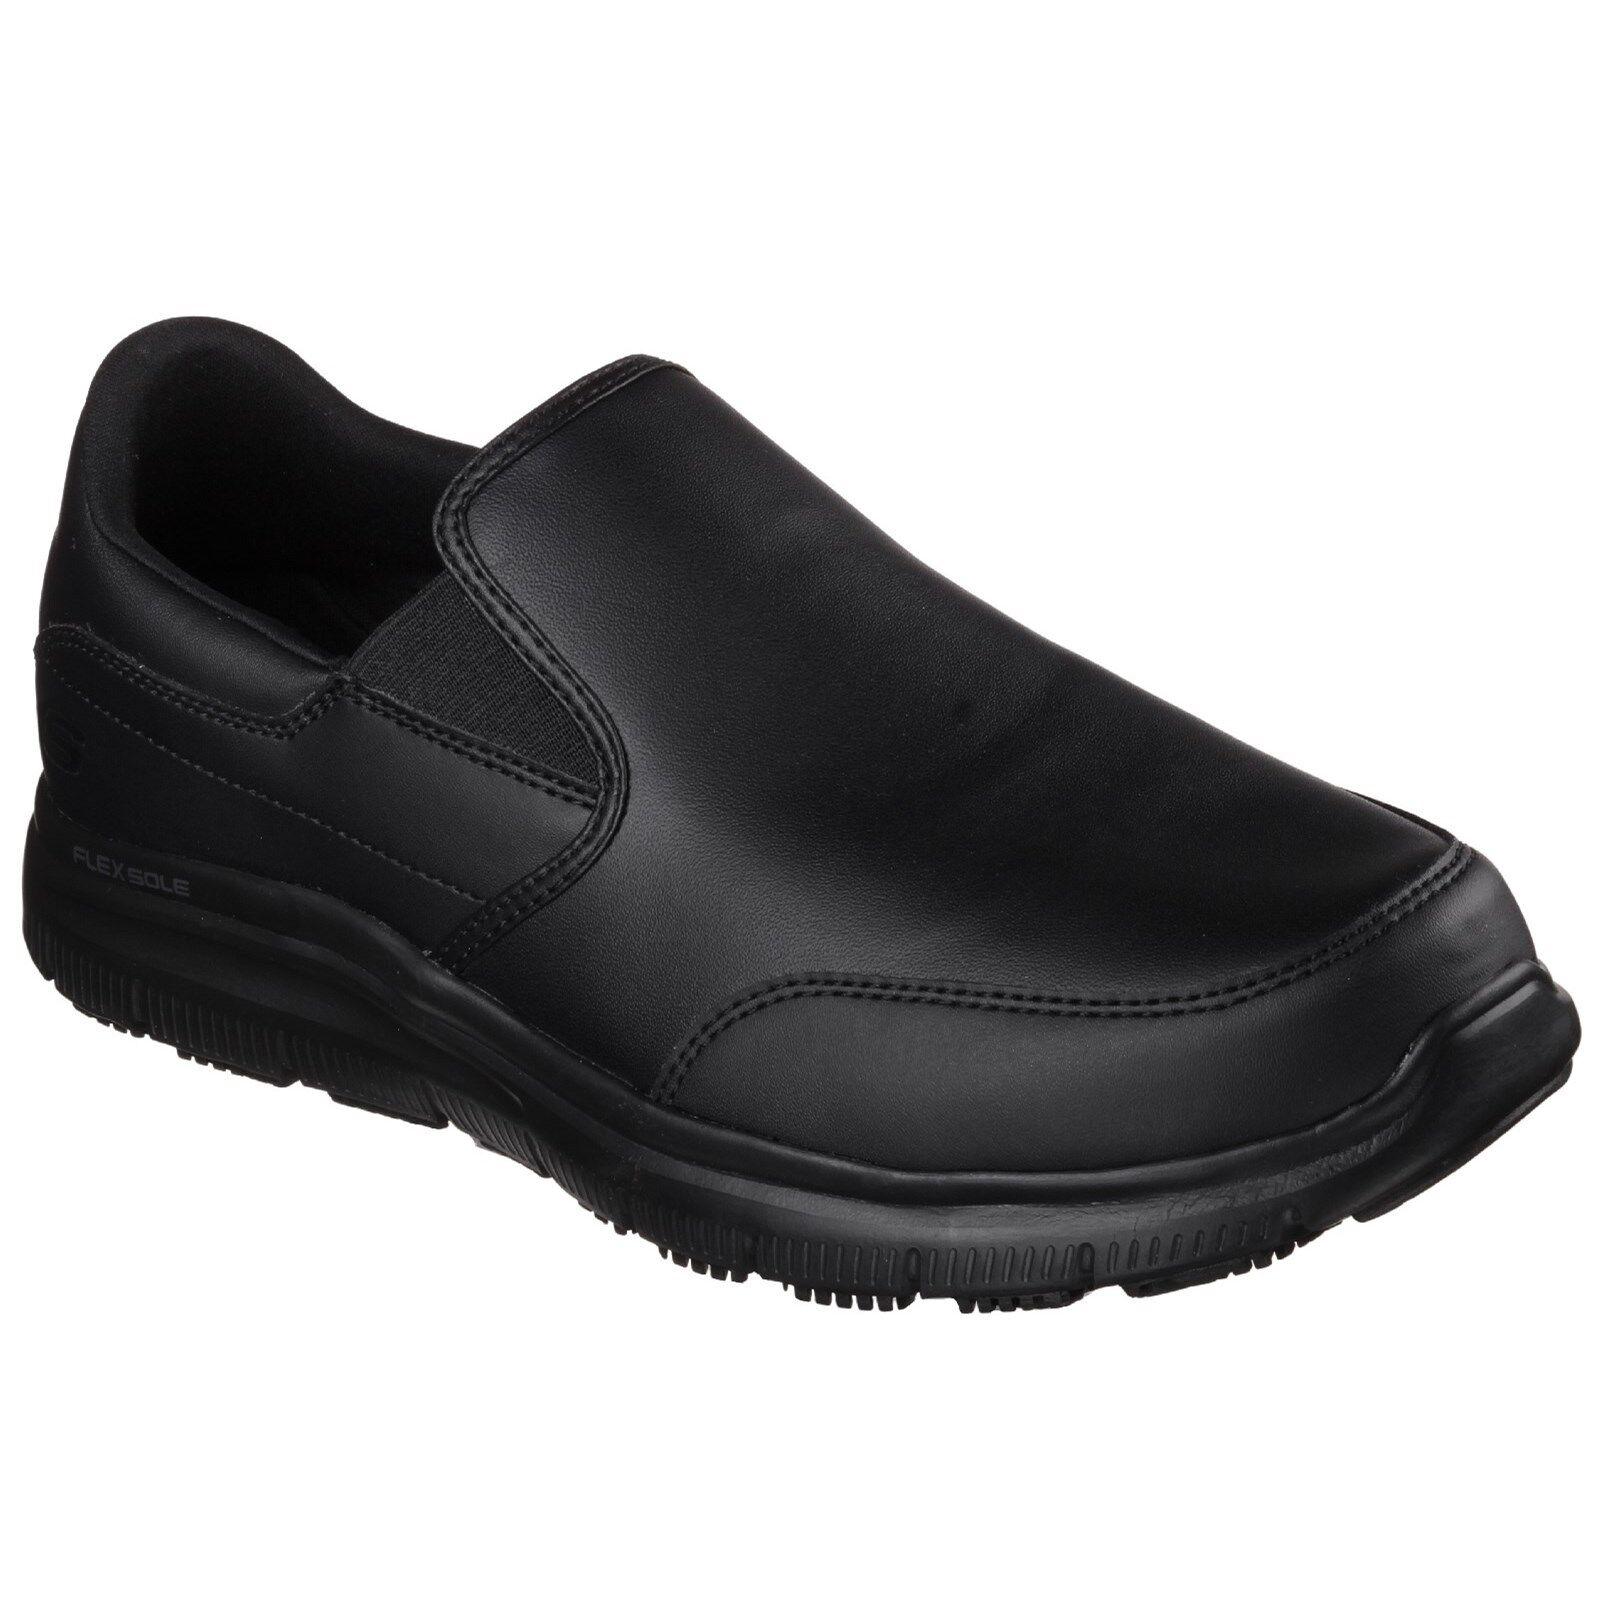 Skechers Flex Advantage Bronwood Lavoro Scarpe Antiscivolo Pelle Sneaker Uomo